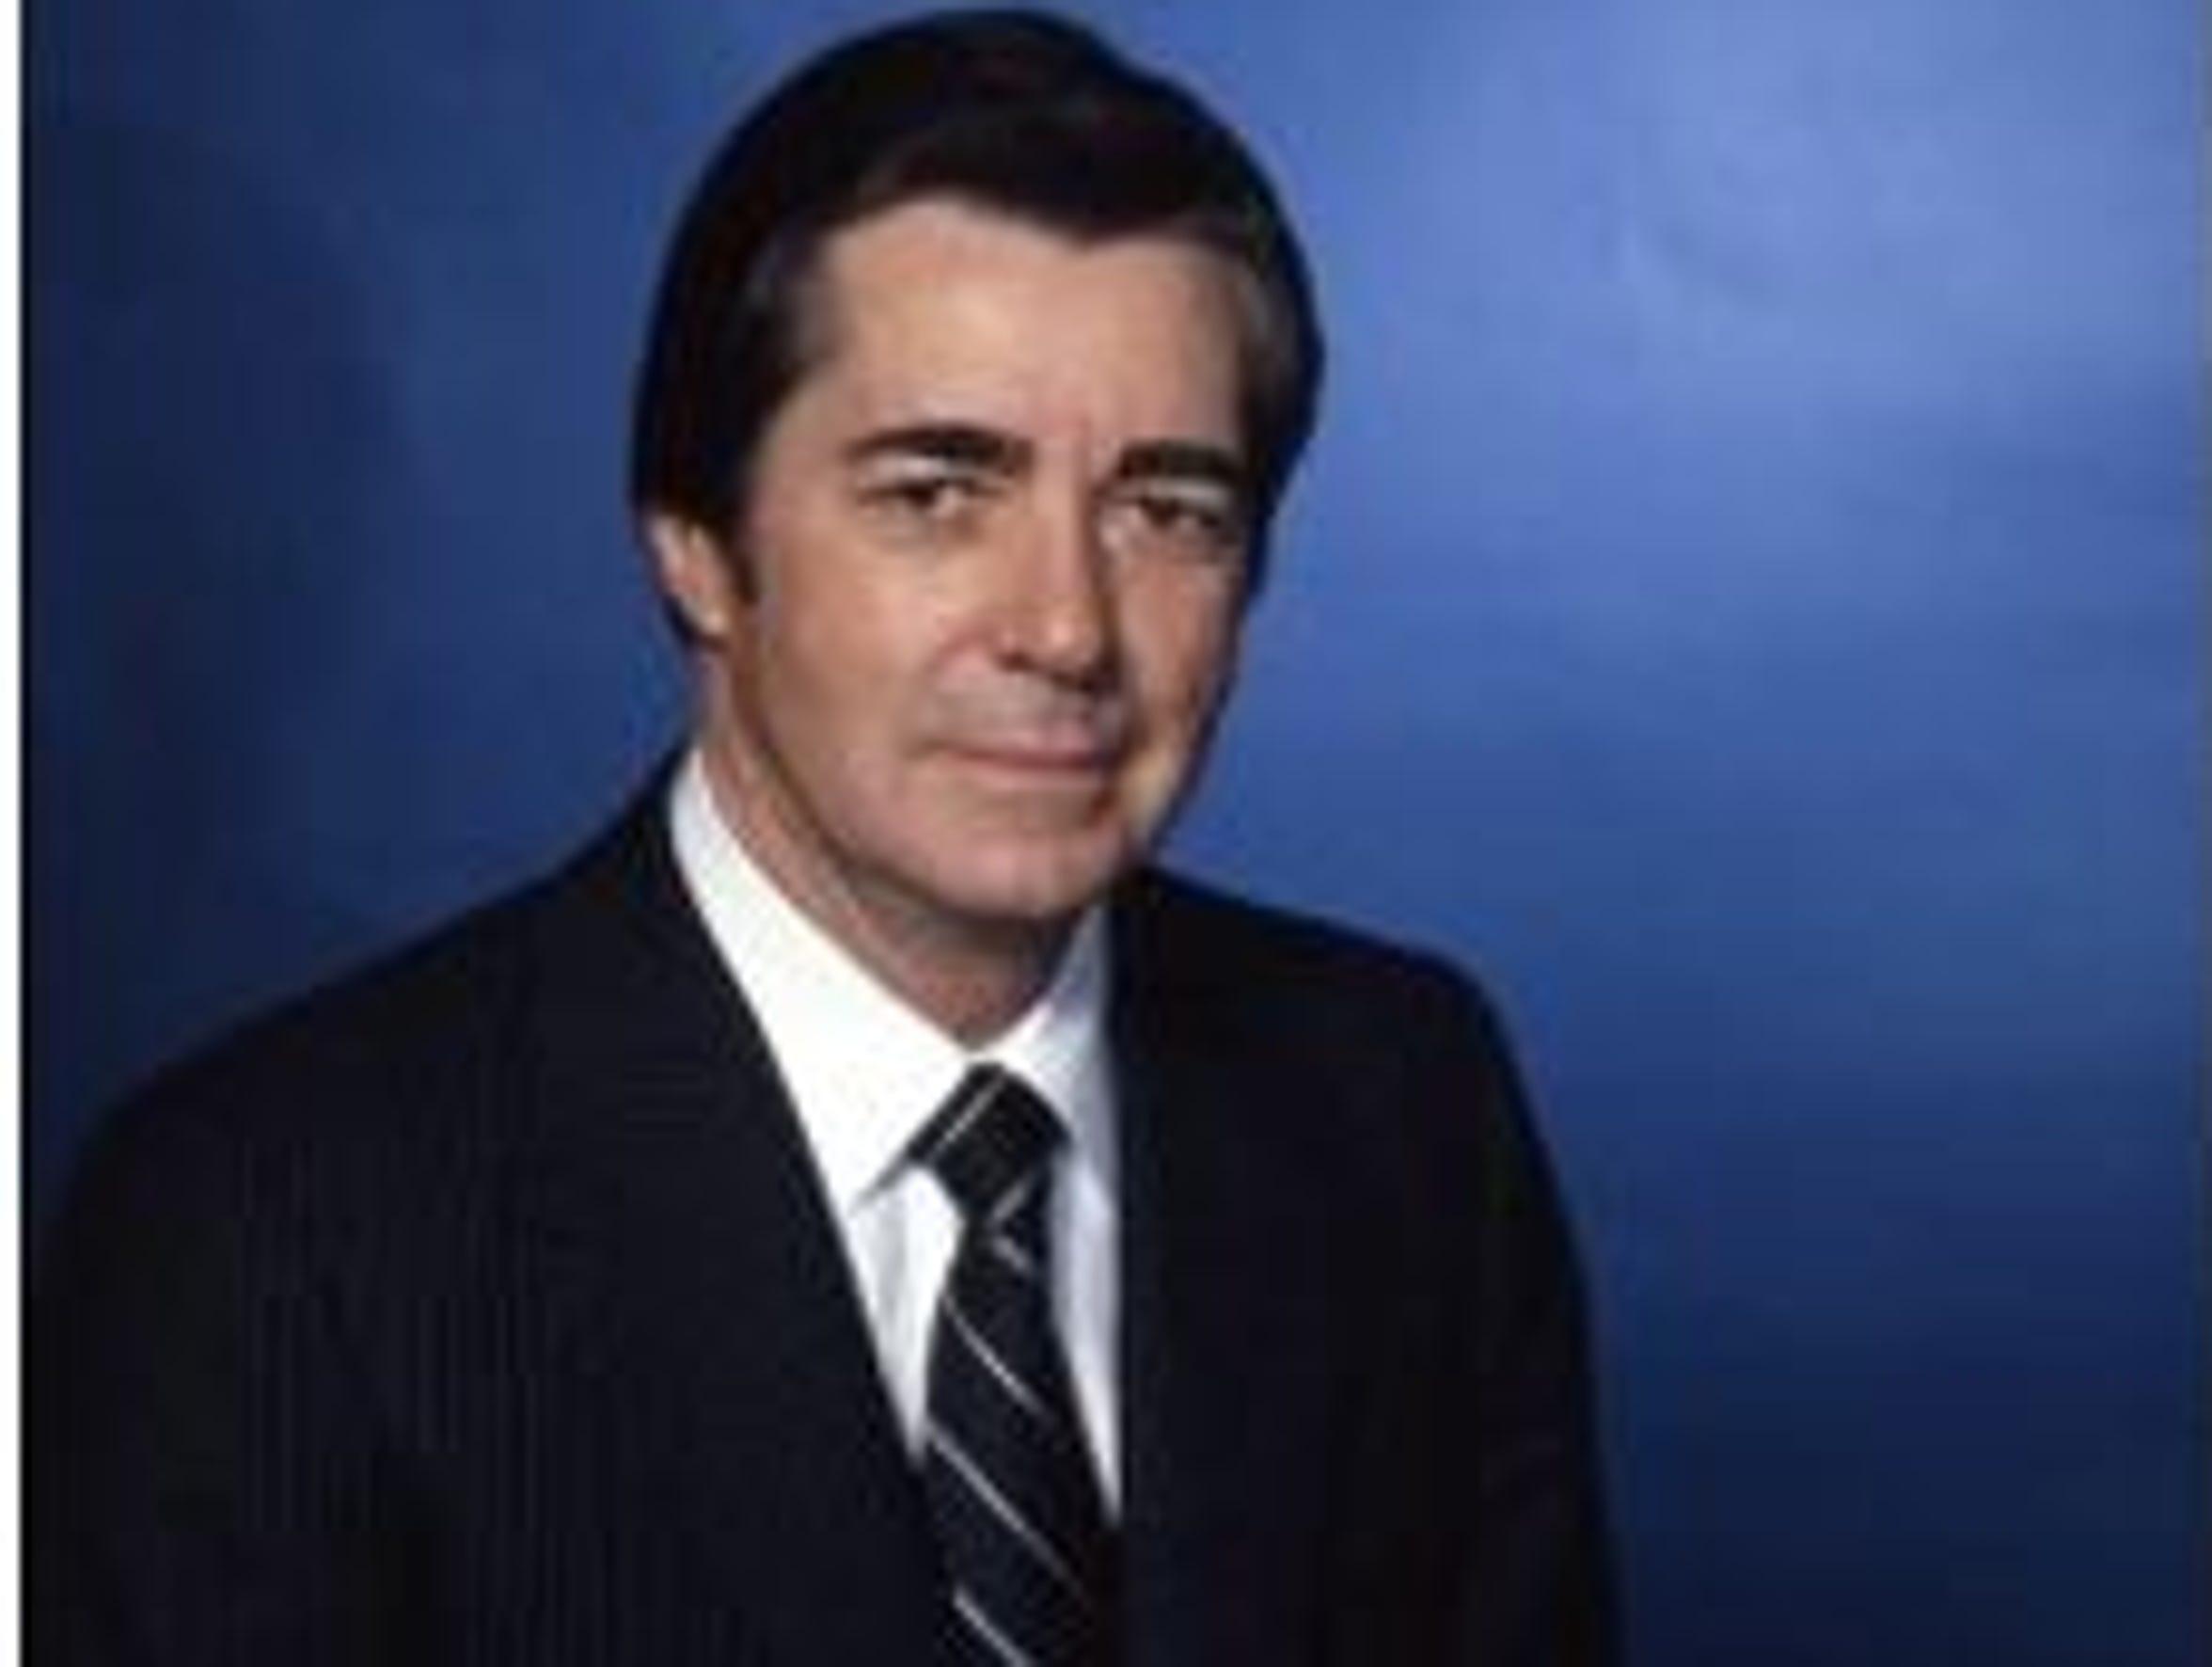 Frank Salter Jr., the district attorney of Calcasieu